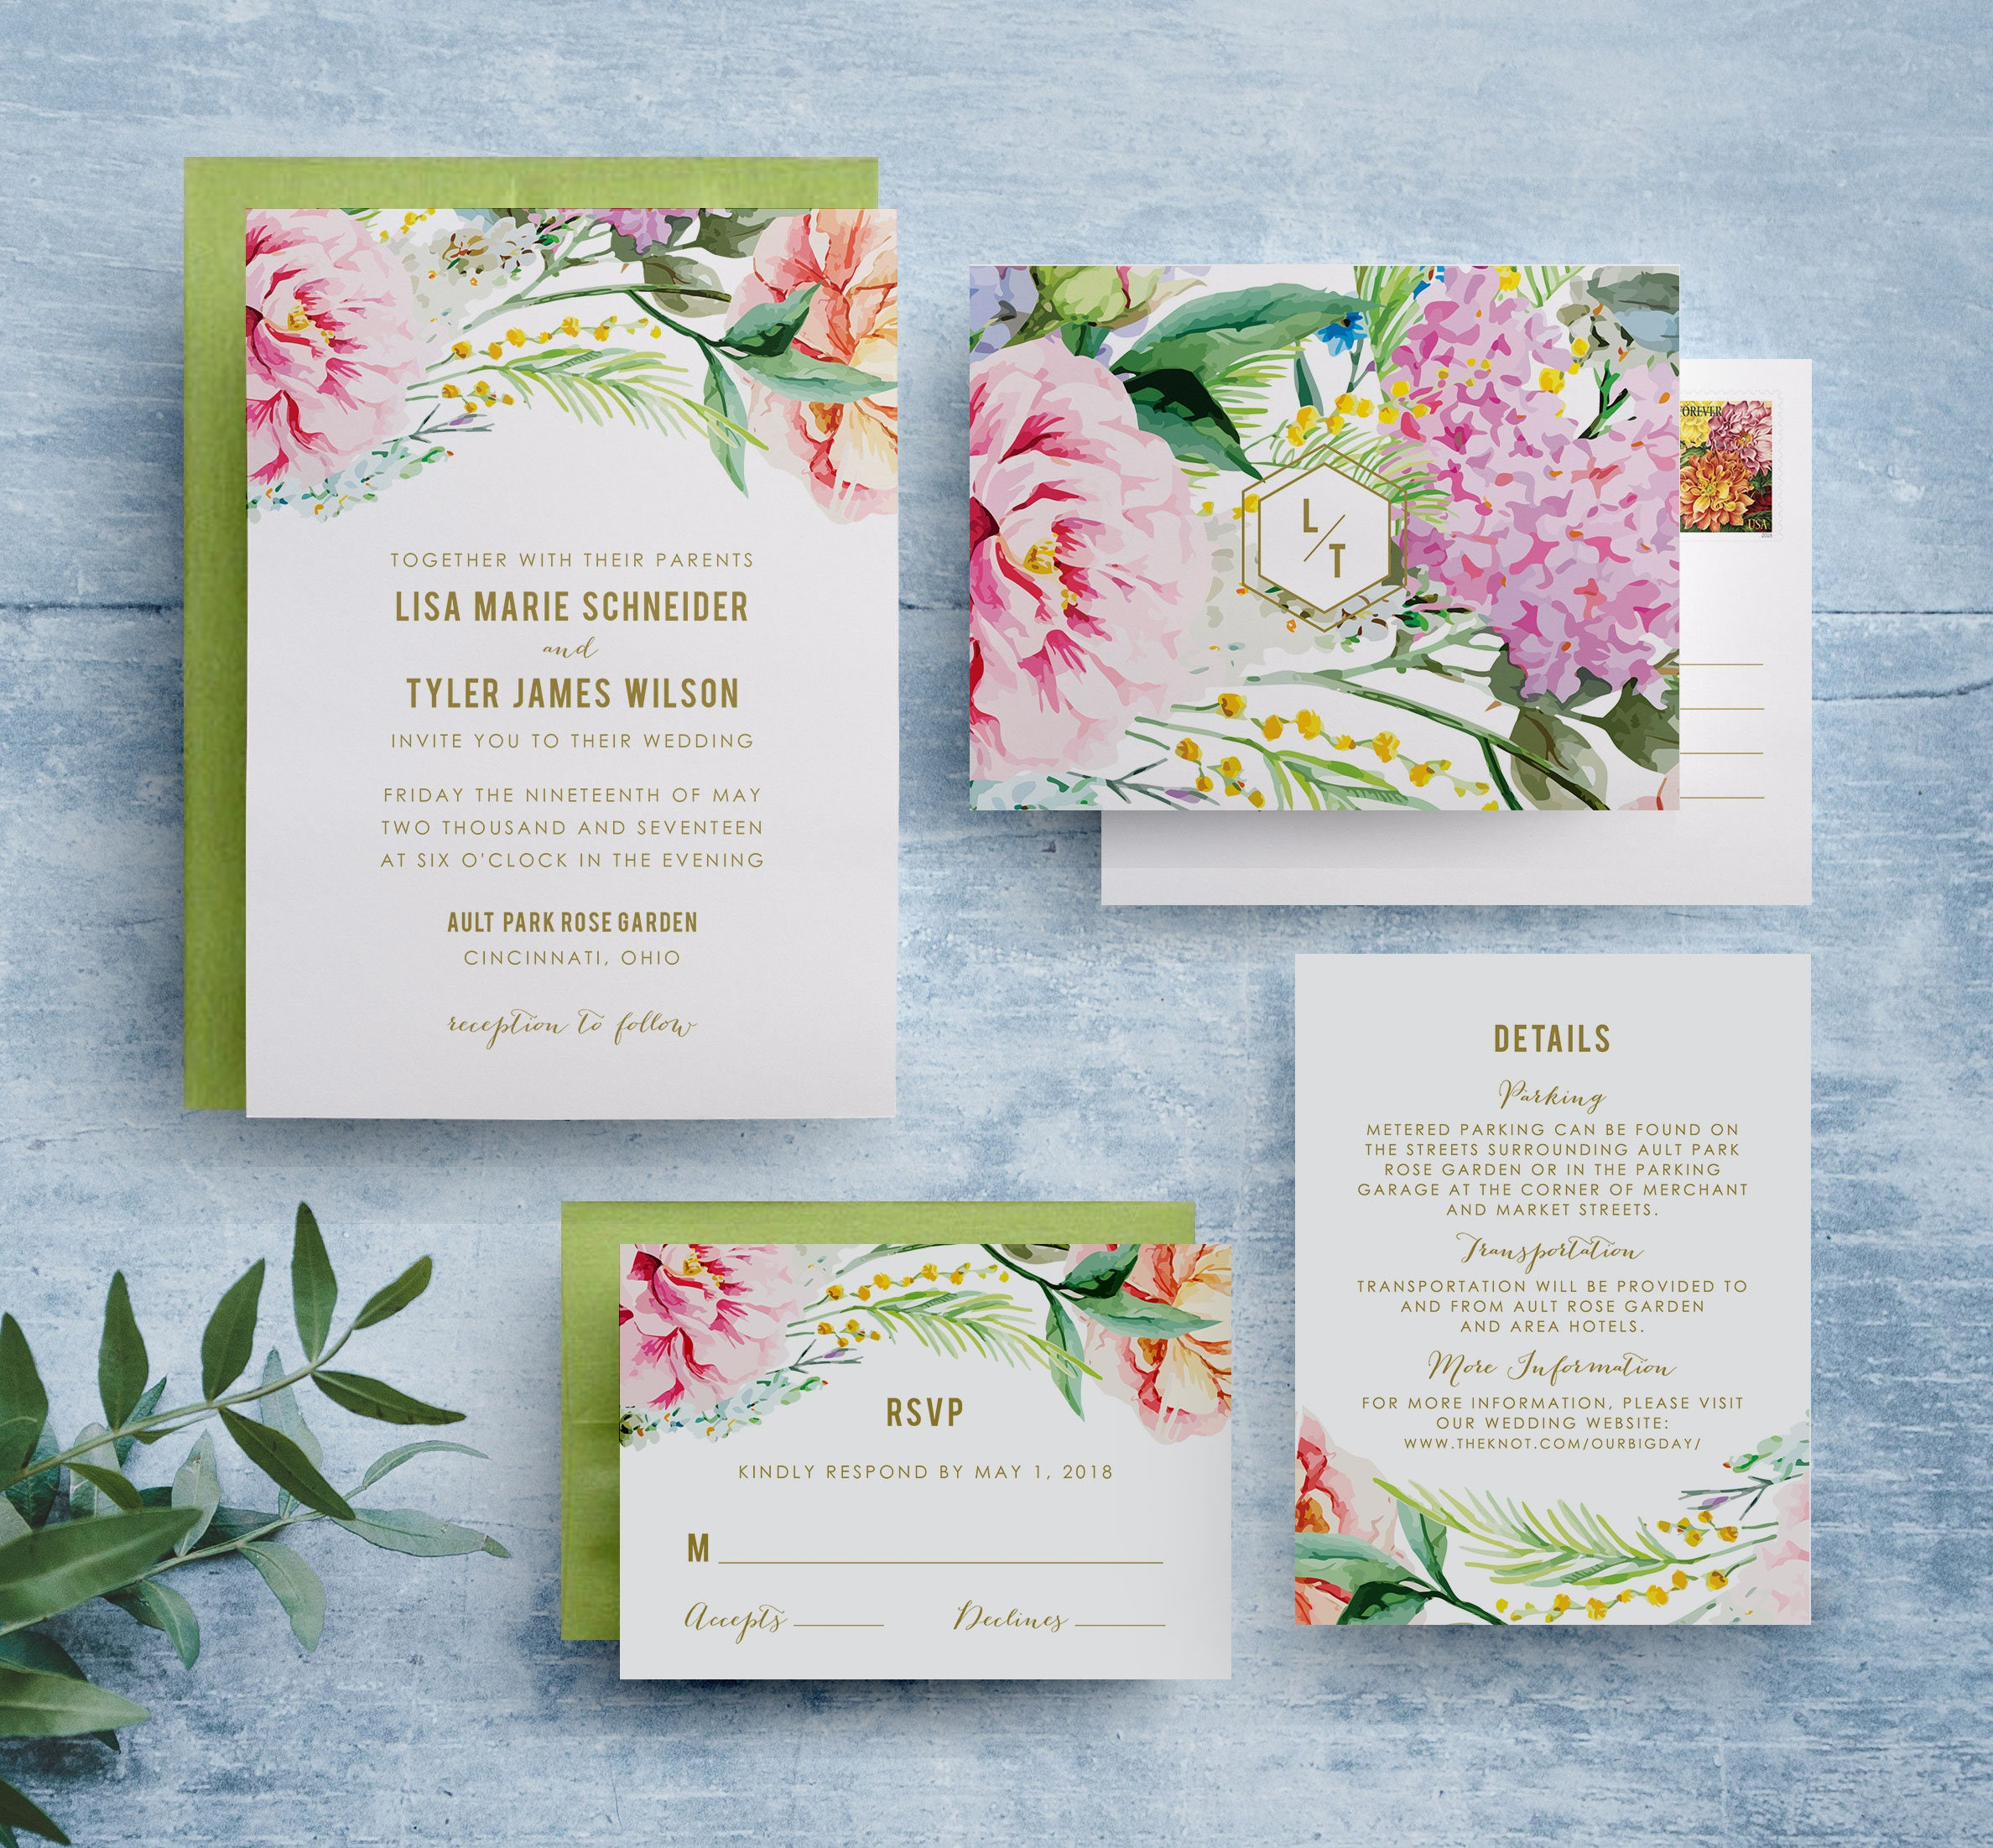 Boho Rustic Wedding Invitations Bohemian Floral Wedding